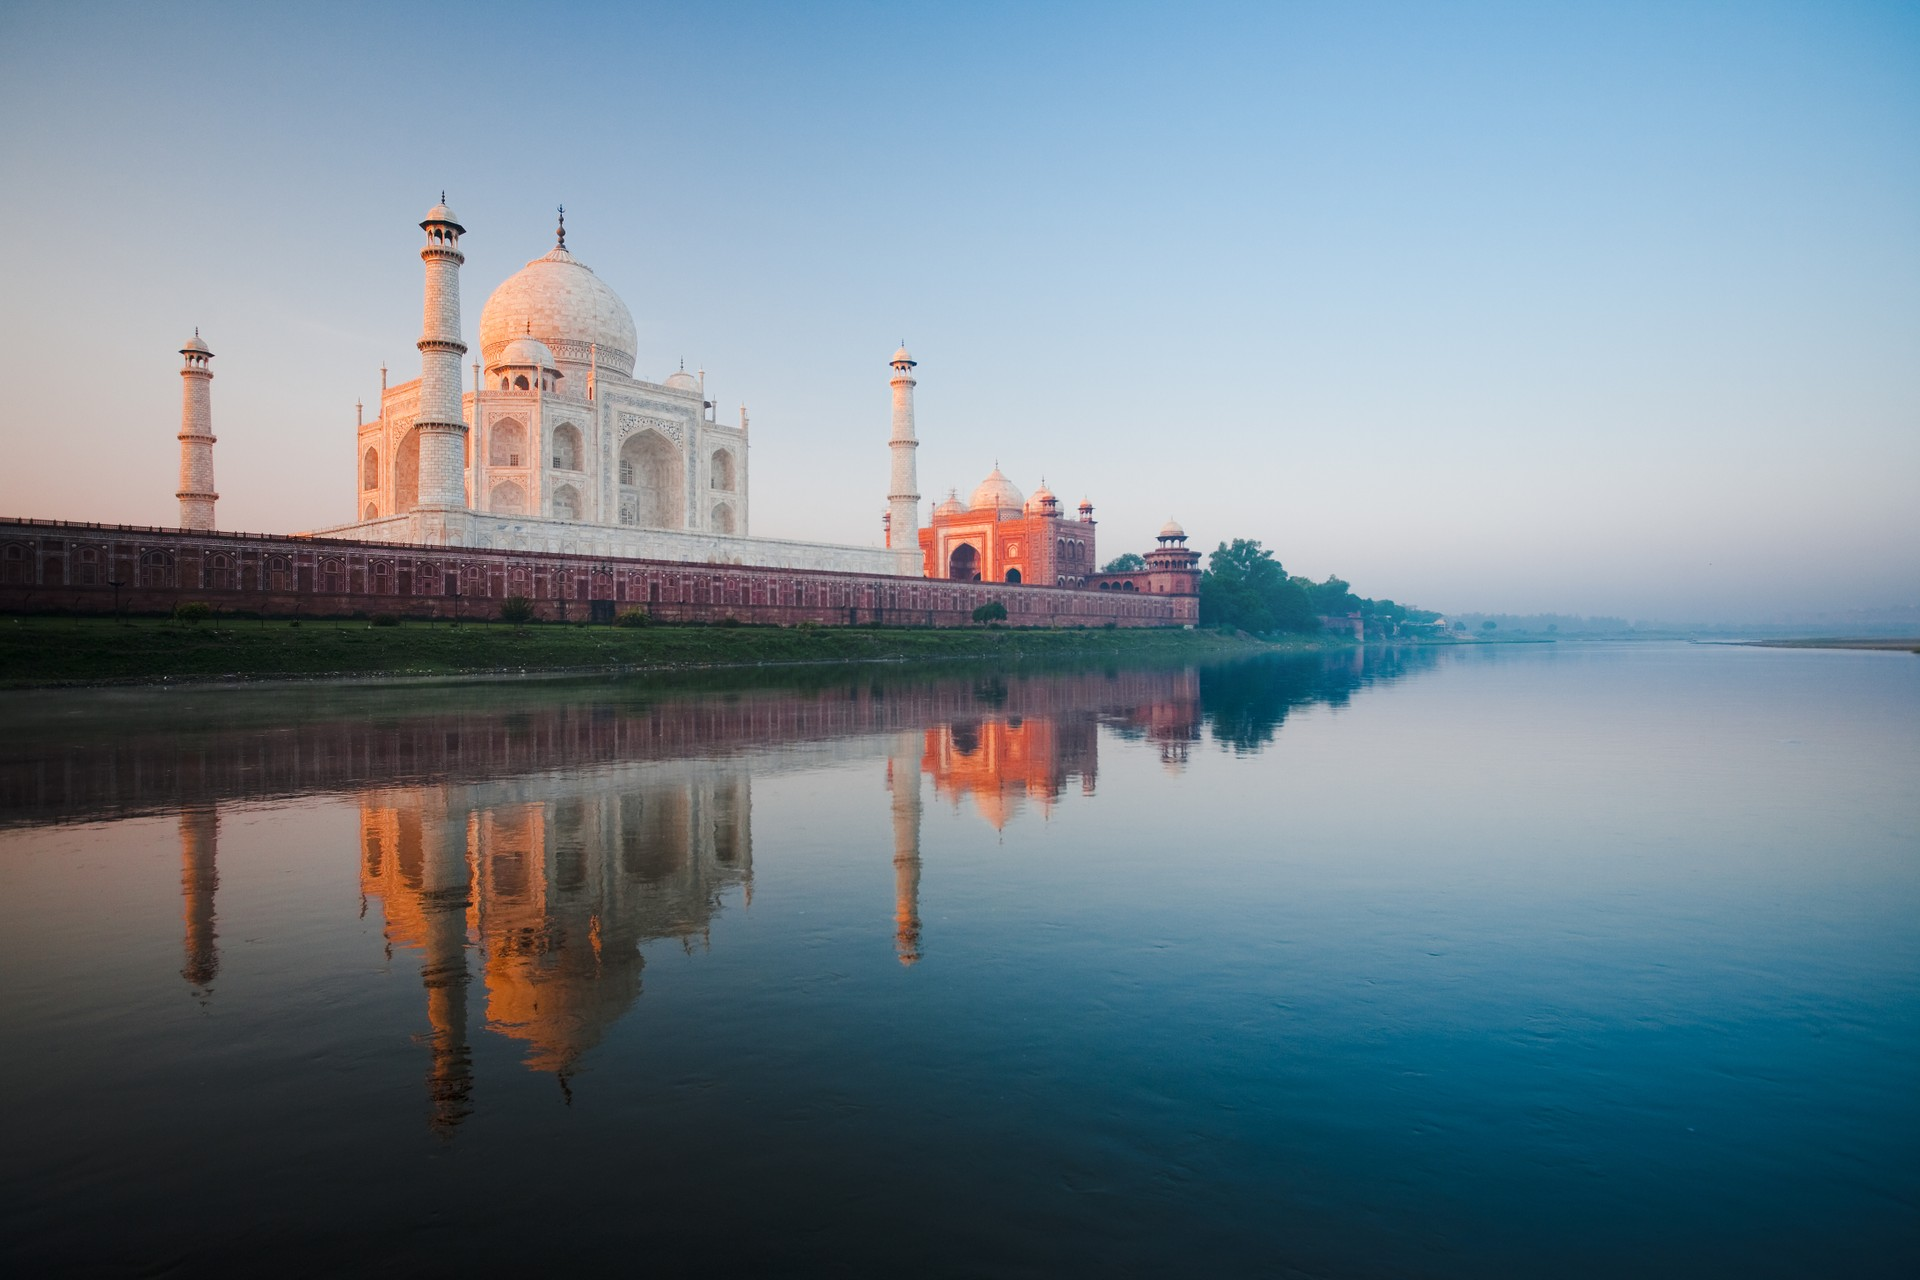 Taj Mahal from the water